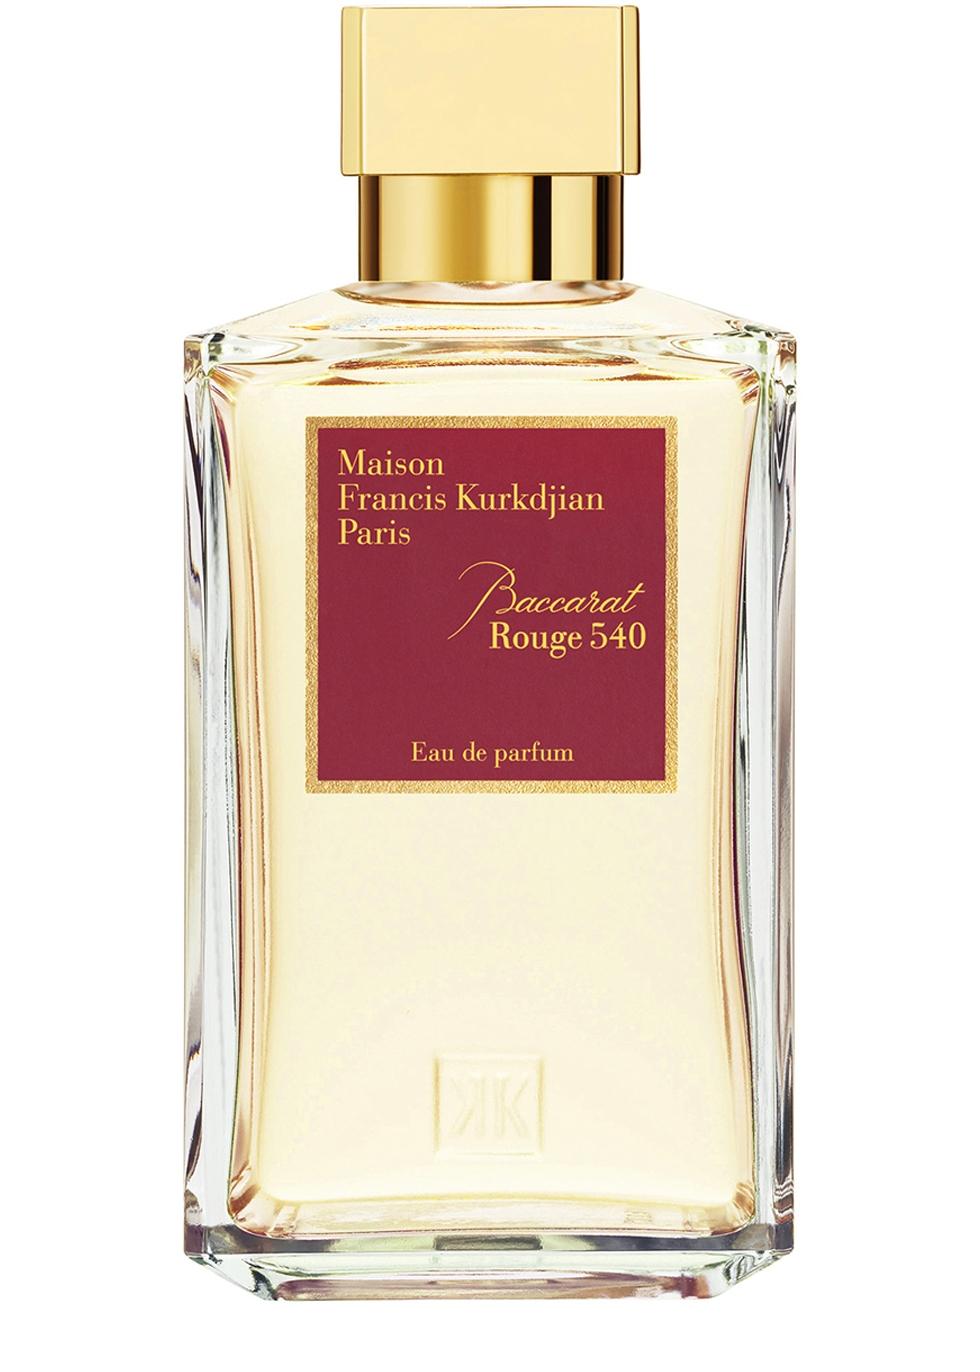 Maison Francis Kurkdjian Baccarat Rouge 20 Eau De Parfum 20ml ...